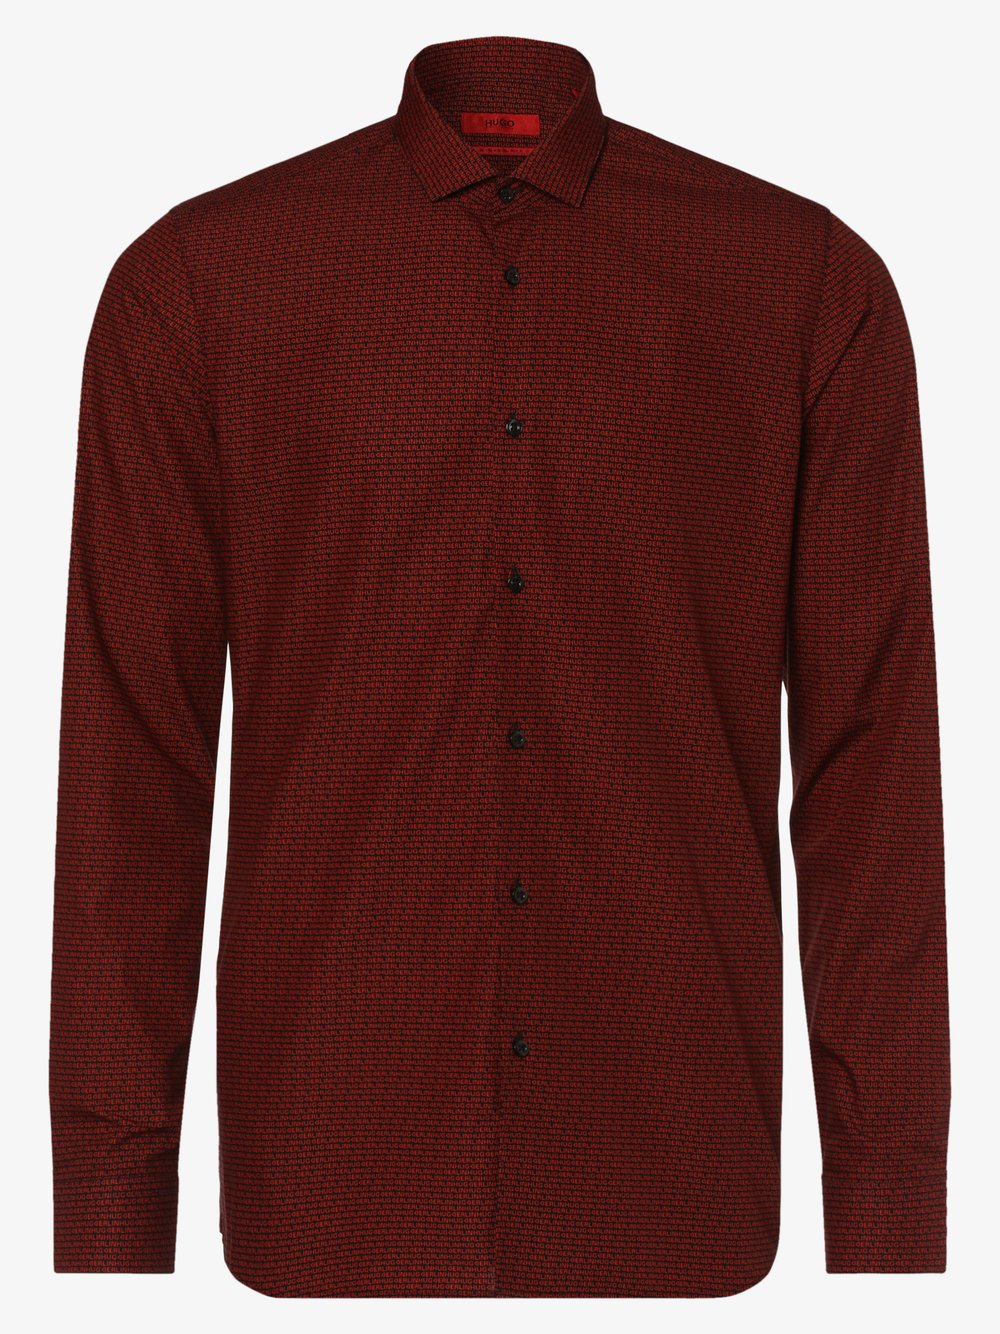 HUGO - Koszula męska – Erondo, czerwony